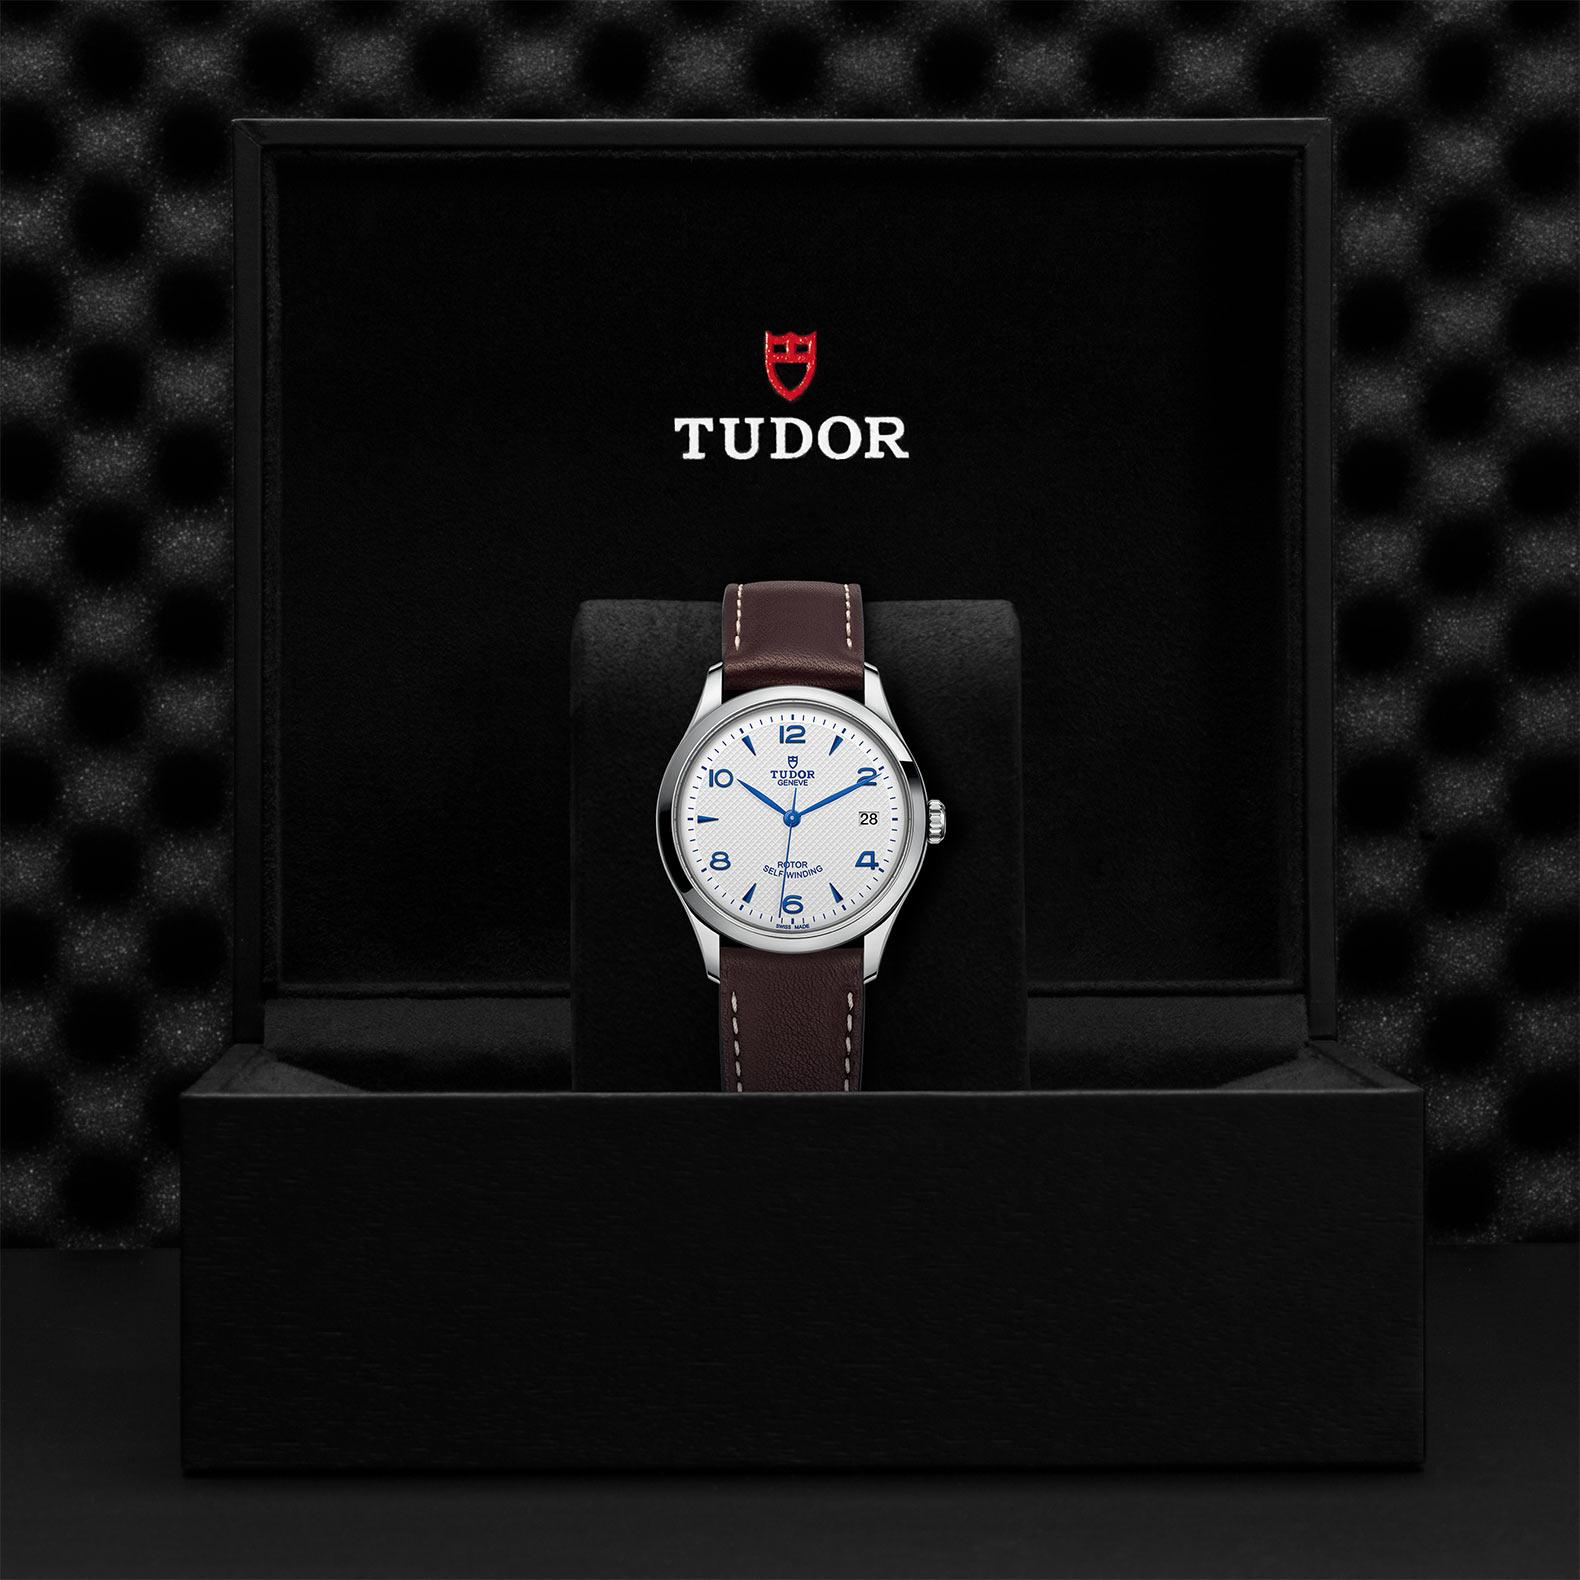 TUDOR 1926 - M91450-0010